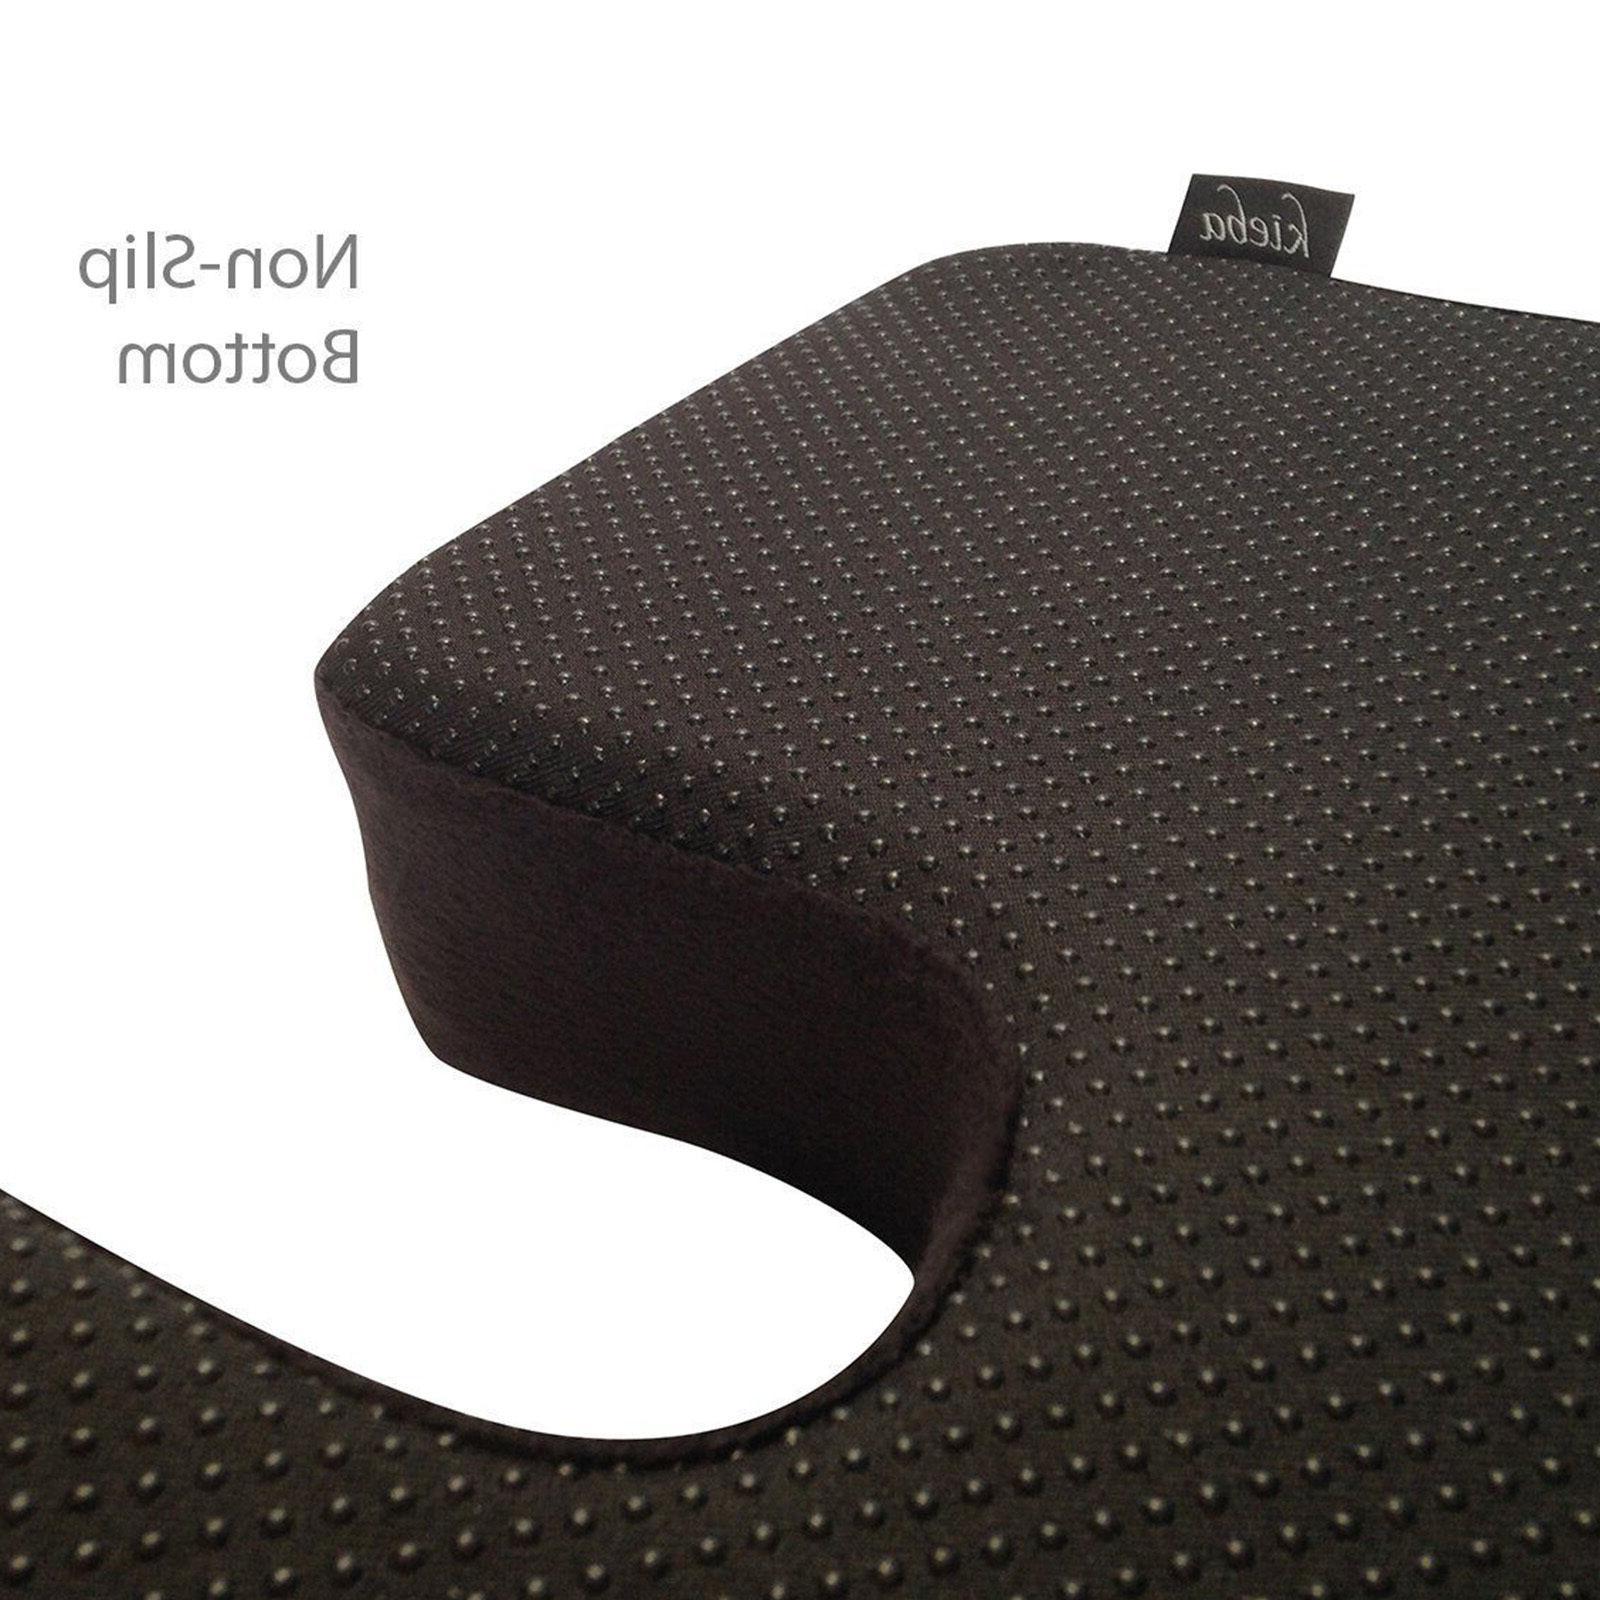 Truck Seat Cushion Memory Foam Tailbone Large